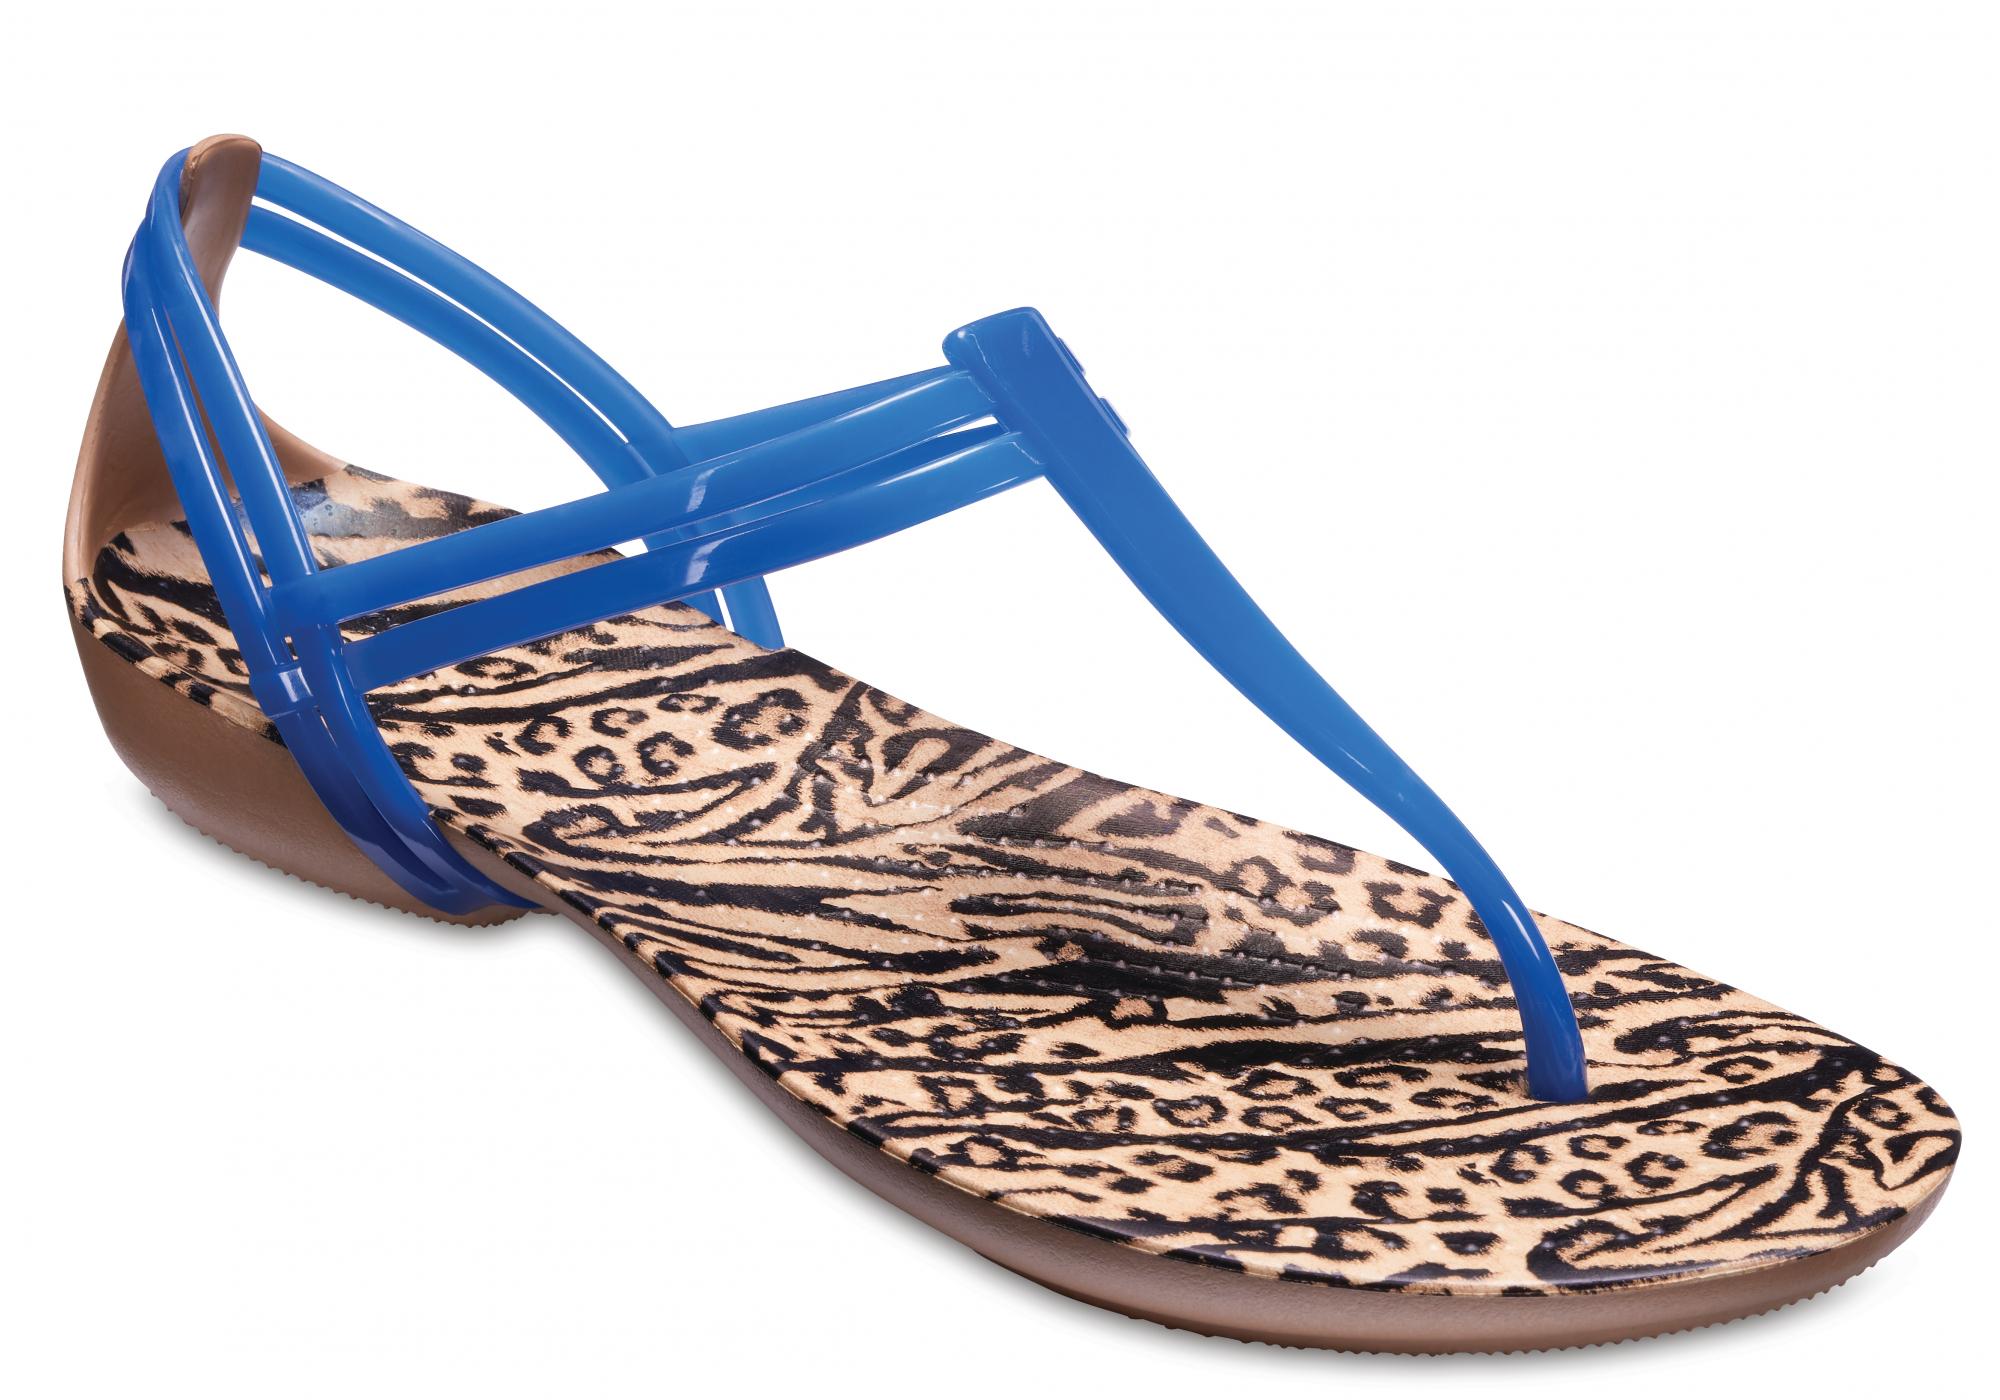 dámské sandály Crocs Crocs Isabella Graphic Ttrap  6a982323b2